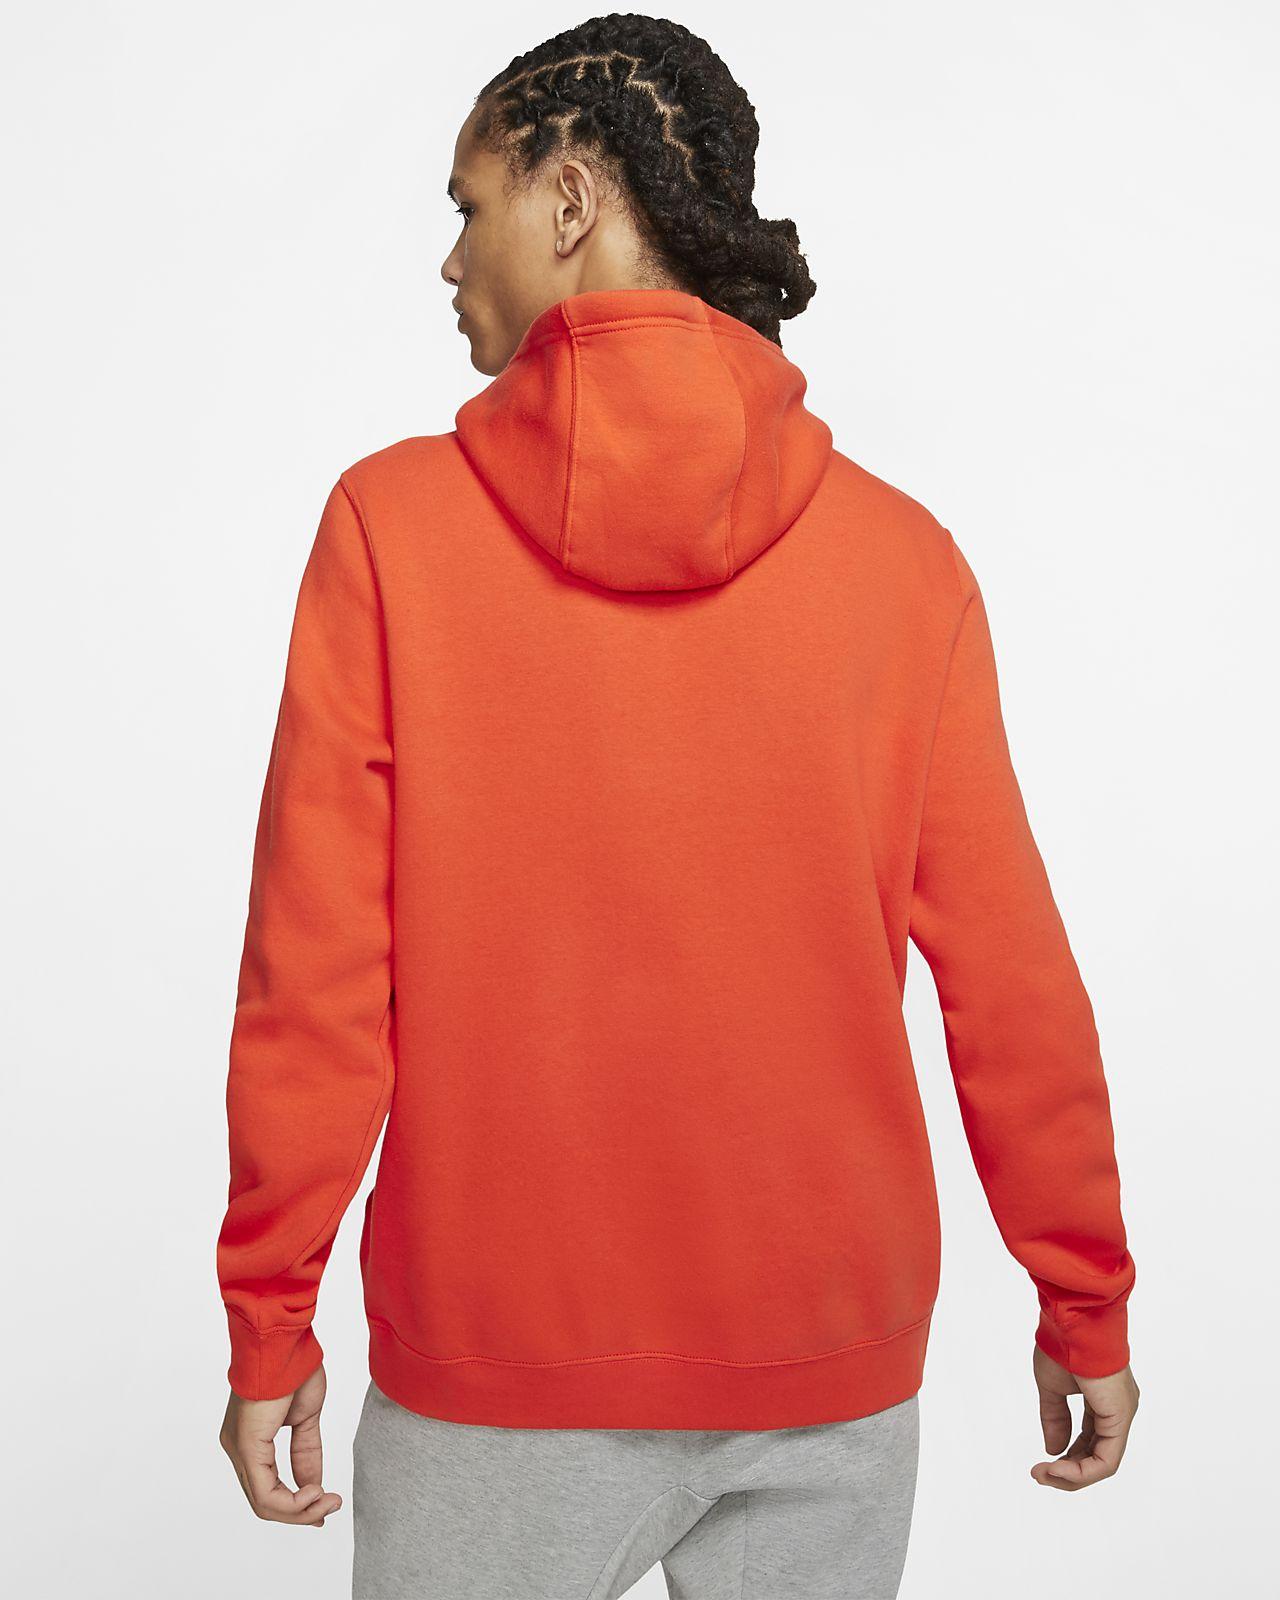 8f5afce7 Nike Sportswear Club Fleece Pullover Hoodie. Nike.com